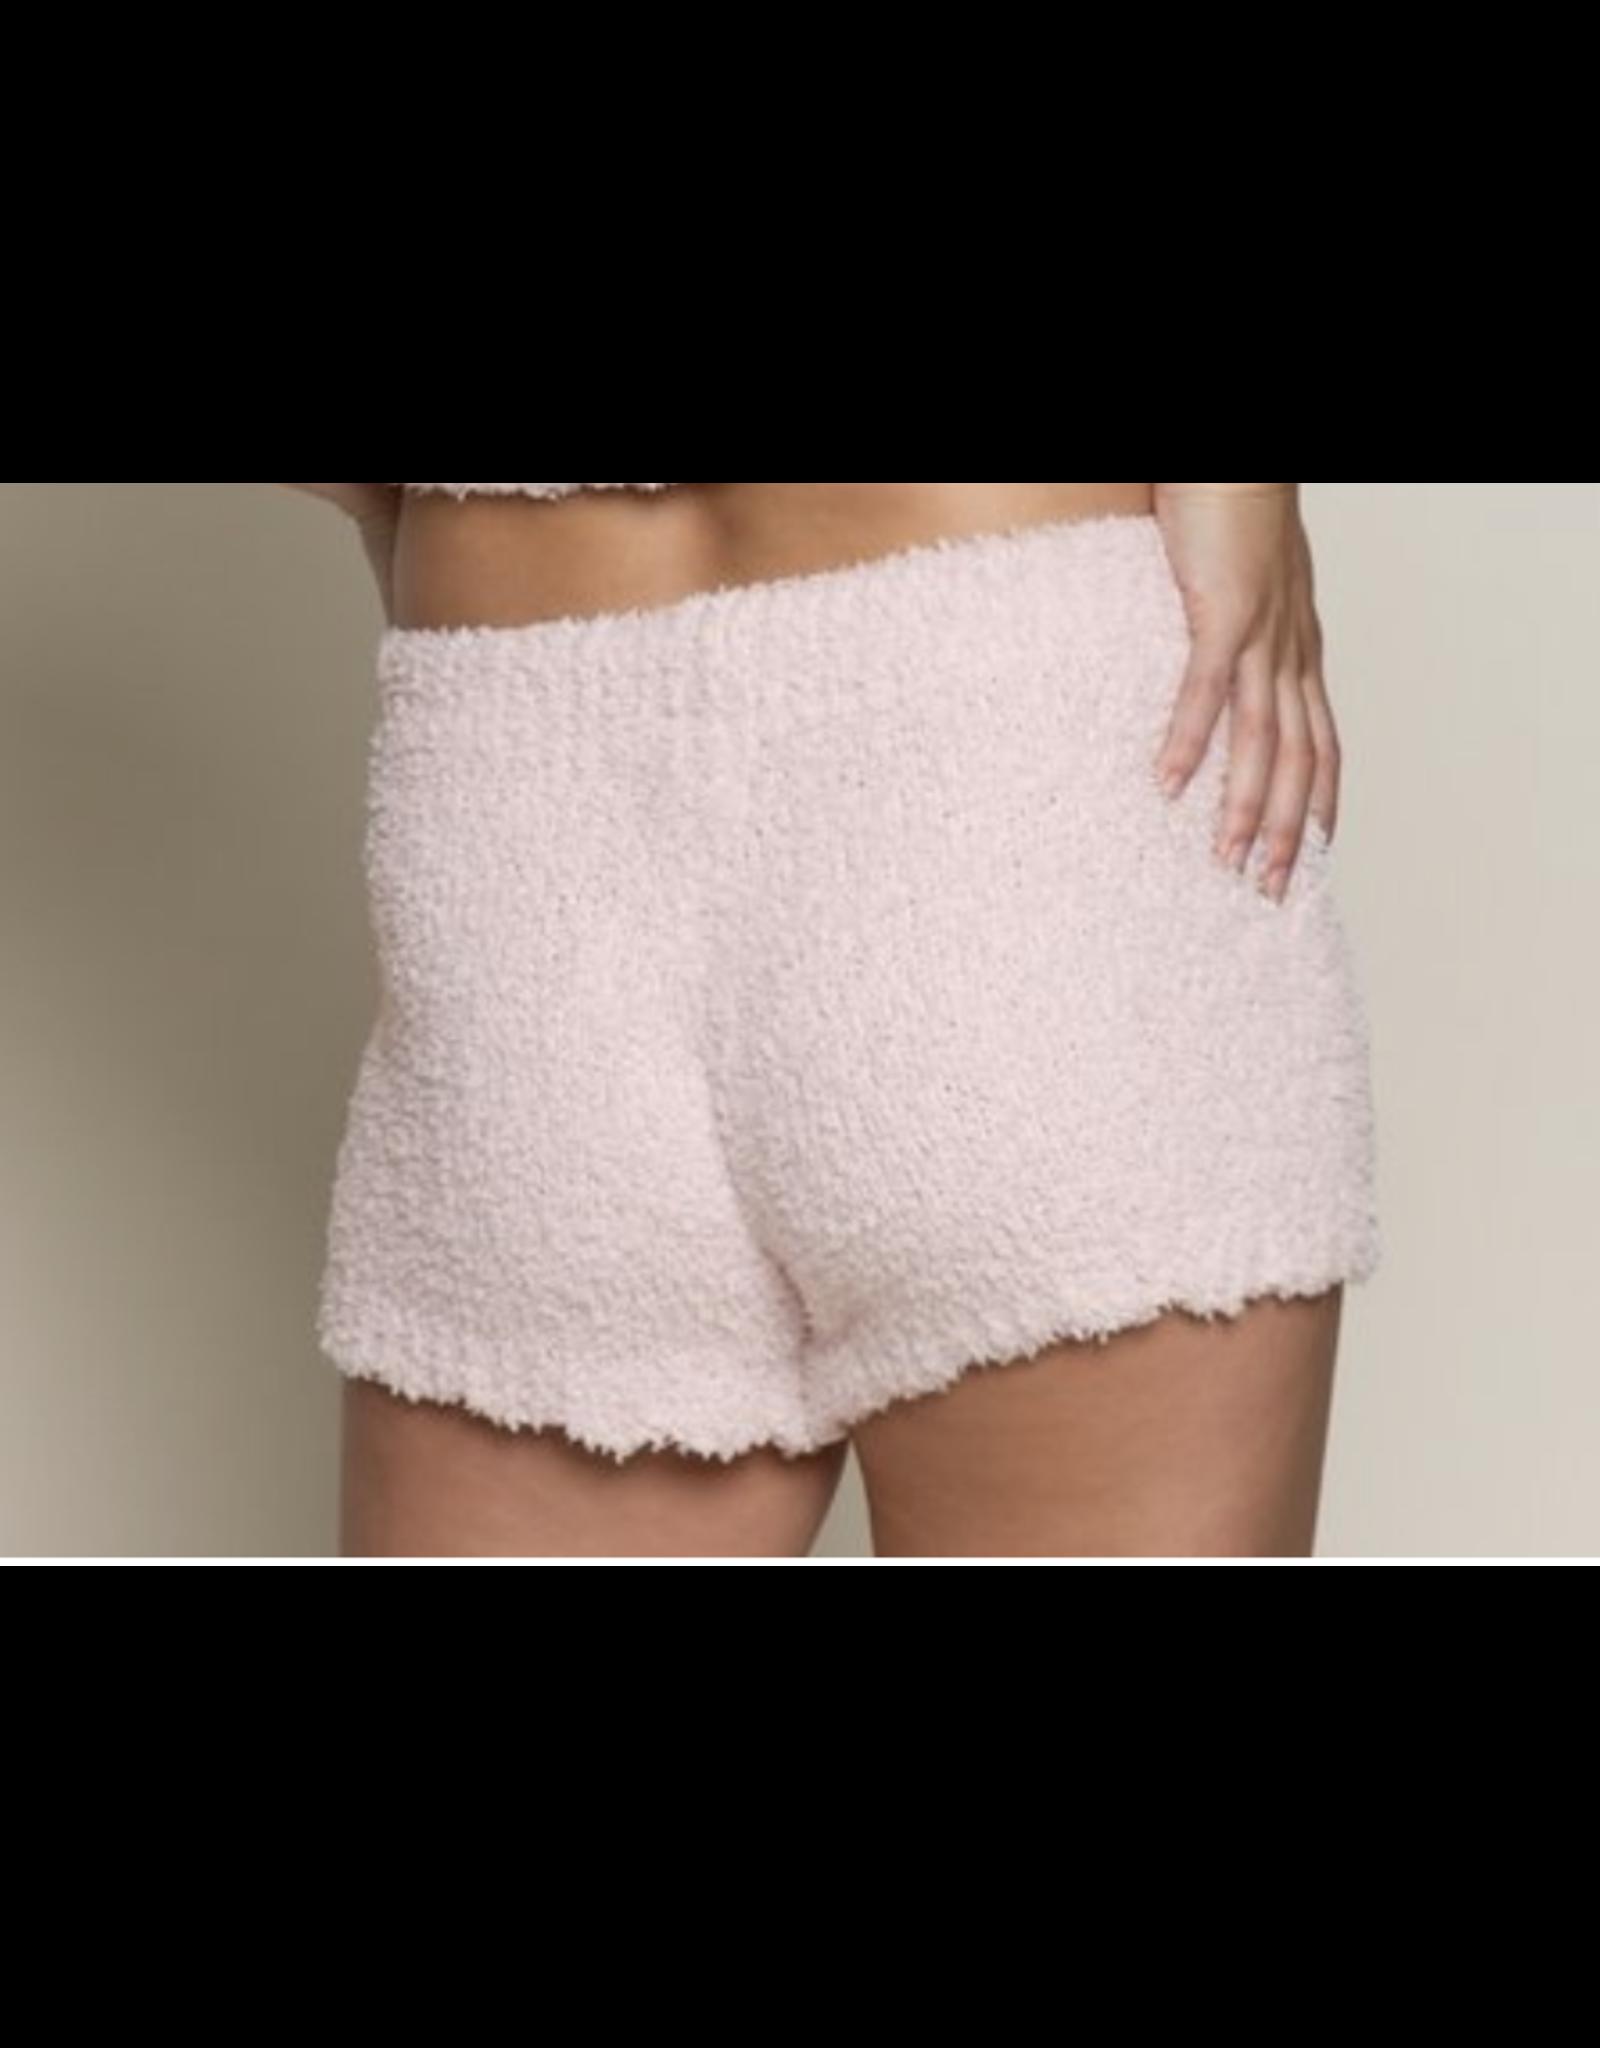 Berber Fleece Lounge Shorts